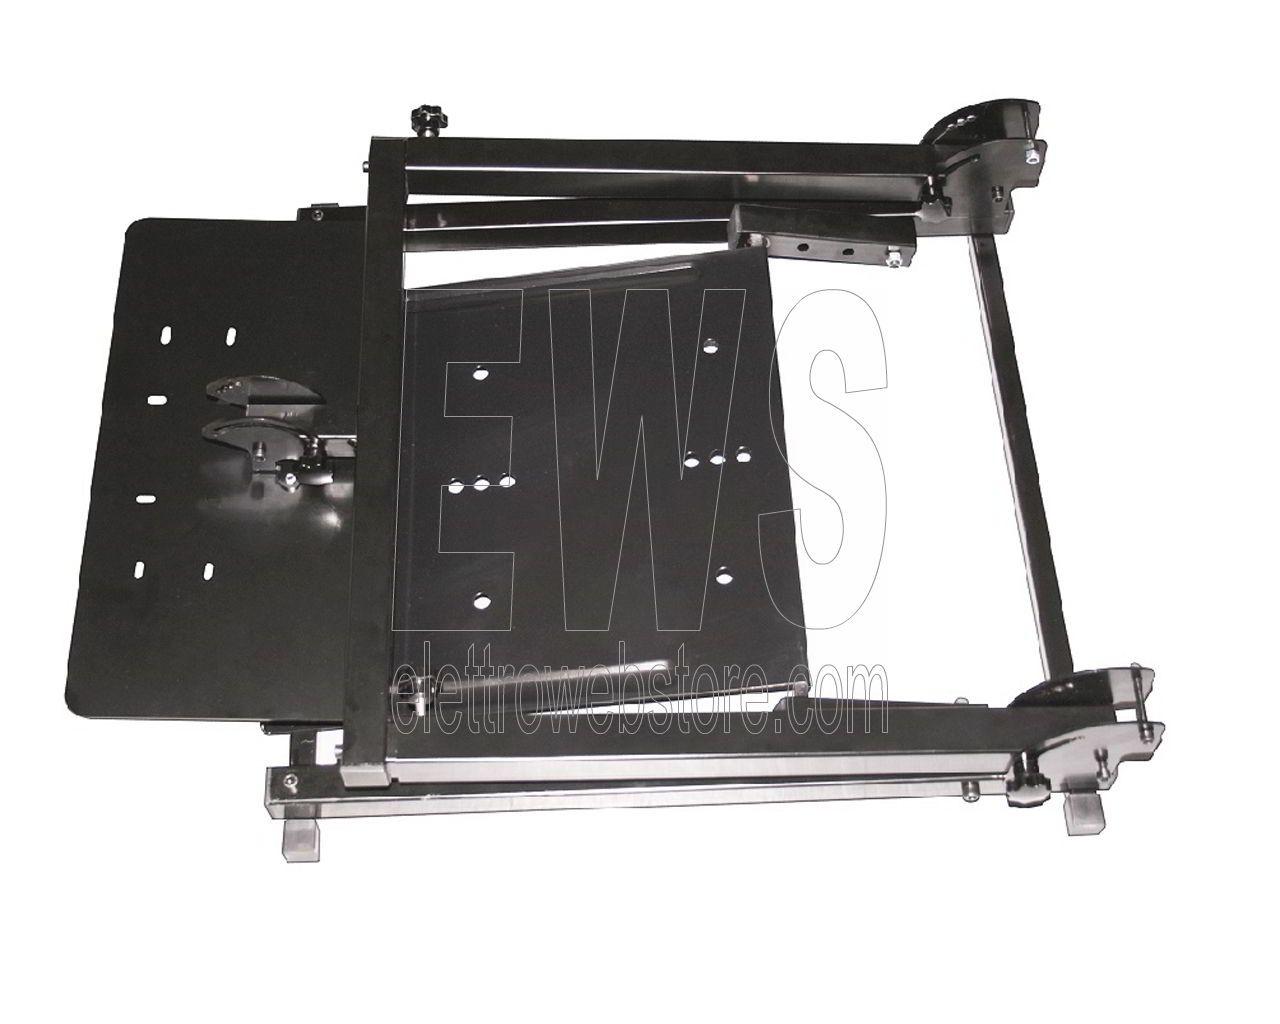 XTREME stand metallo supporto volante pedaliera 90457 game cockpit foldable jarama